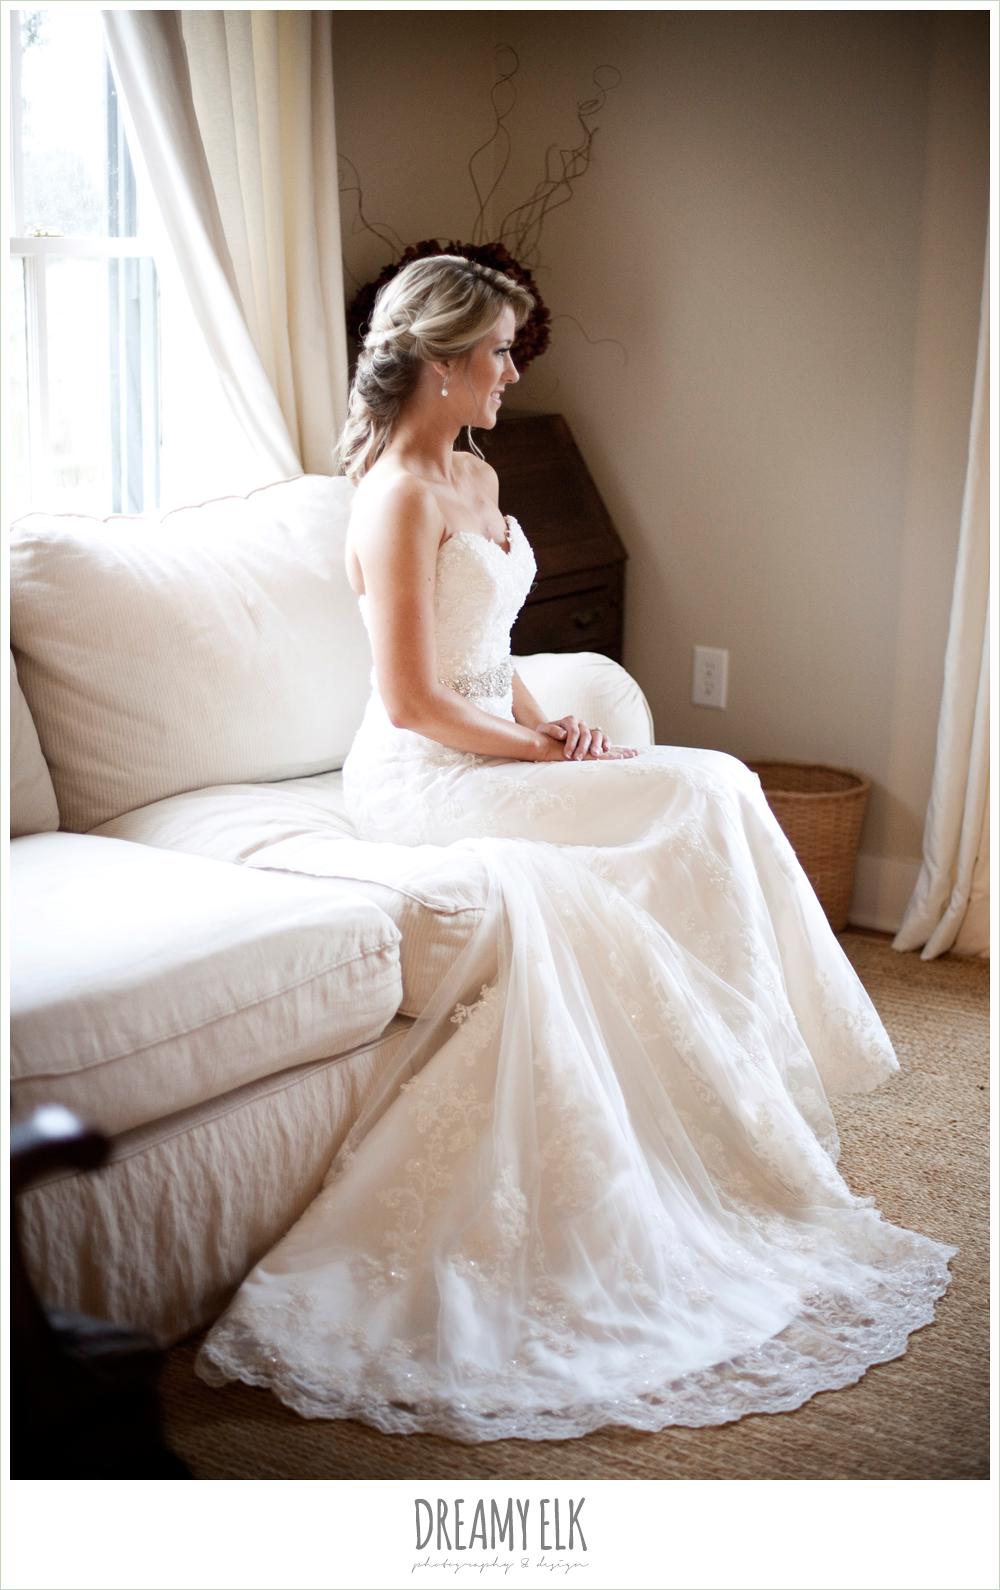 Laurenampjared Wedding Rock Lake Ranch Anderson Texas Dreamy Elk Photography Amp Design